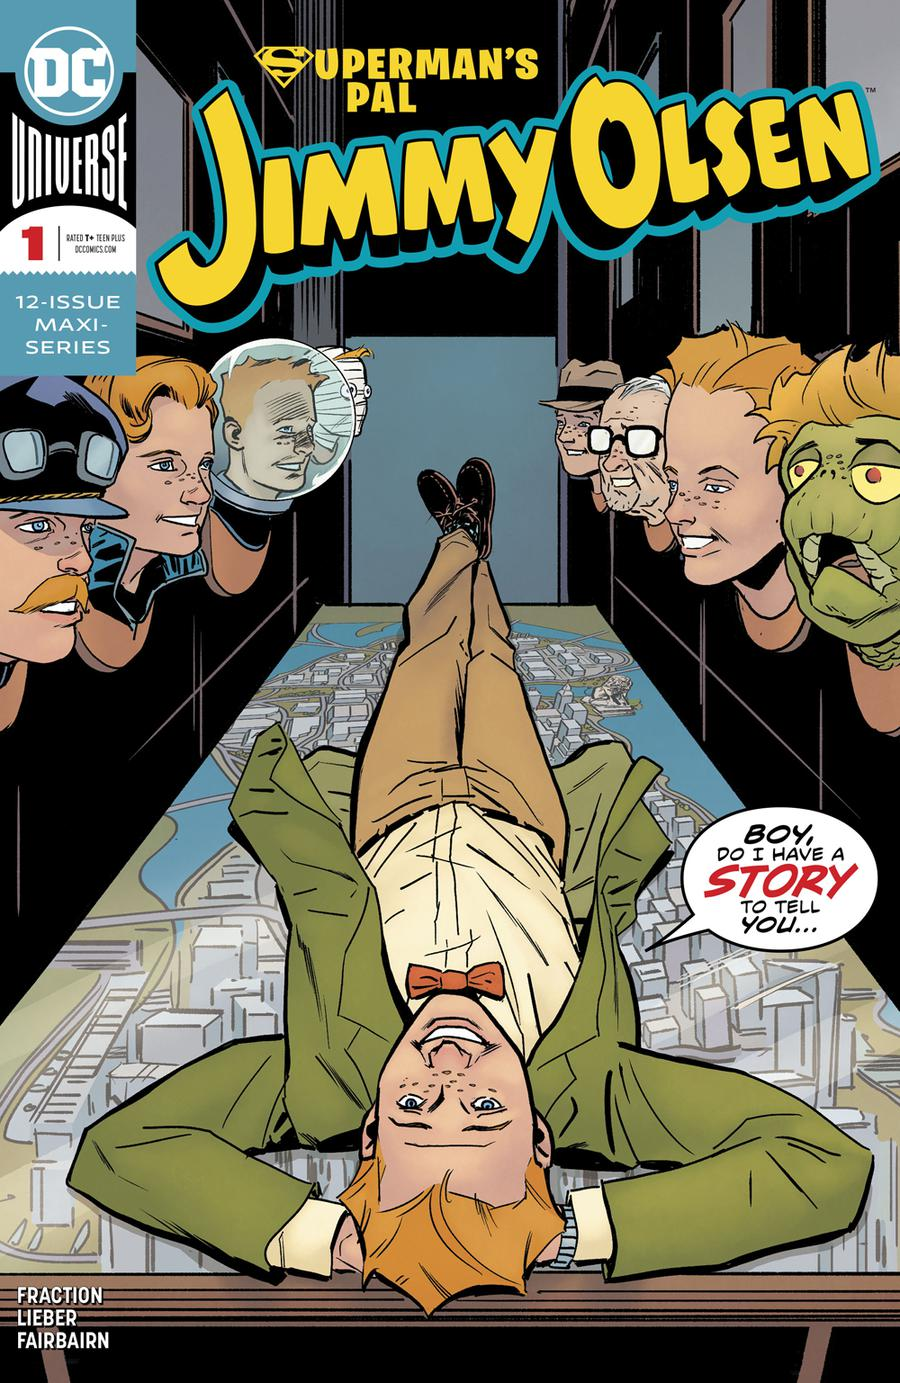 Supermans Pal Jimmy Olsen Vol 2 #1 Cover A Regular Steve Lieber Cover